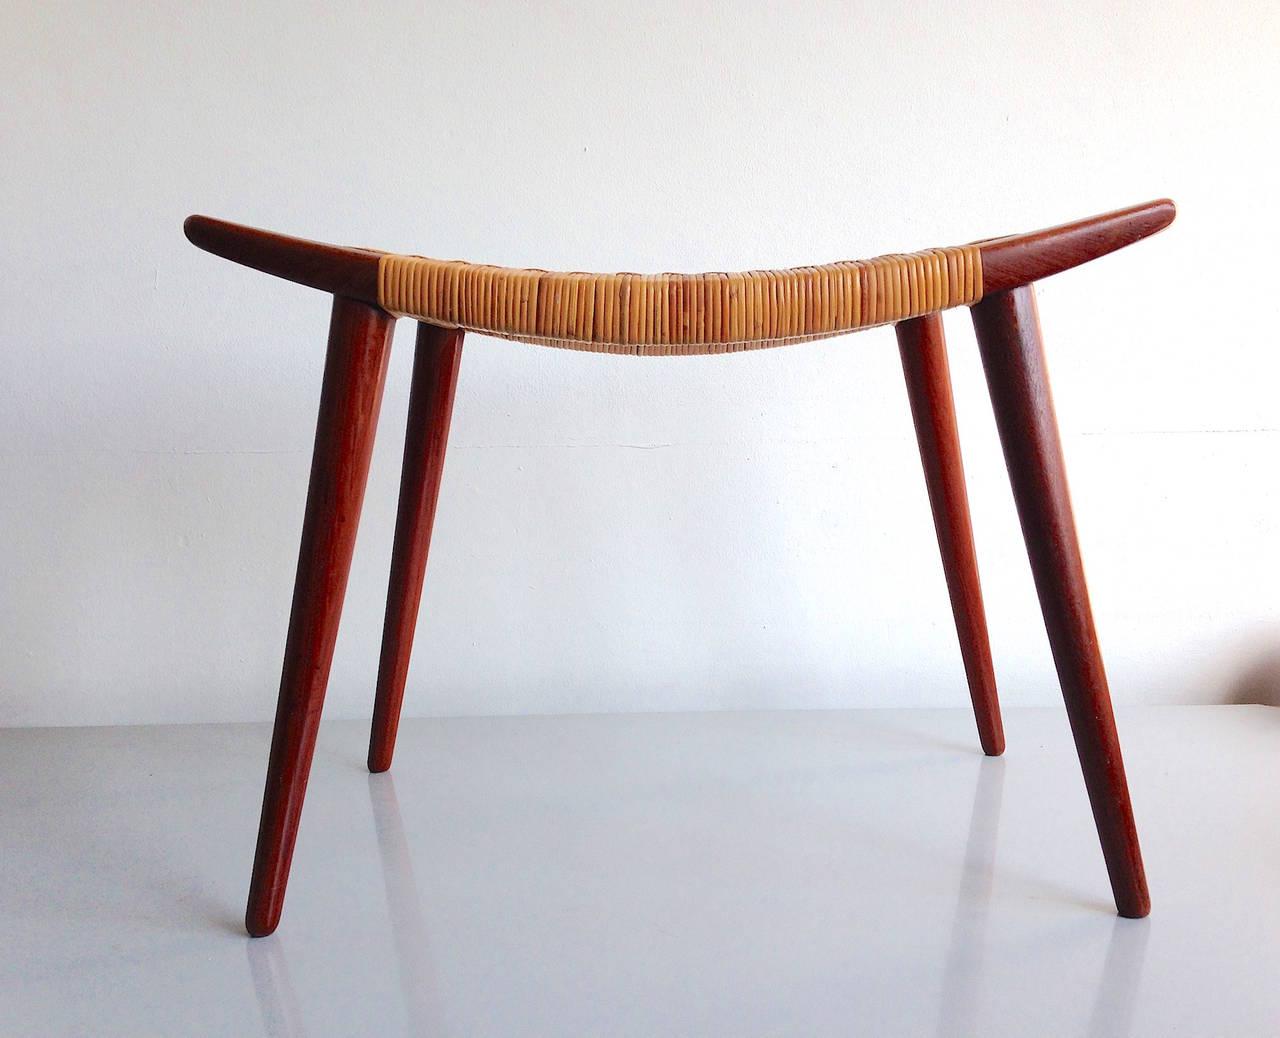 hans wegner johannes hansen cane stool at 1stdibs. Black Bedroom Furniture Sets. Home Design Ideas